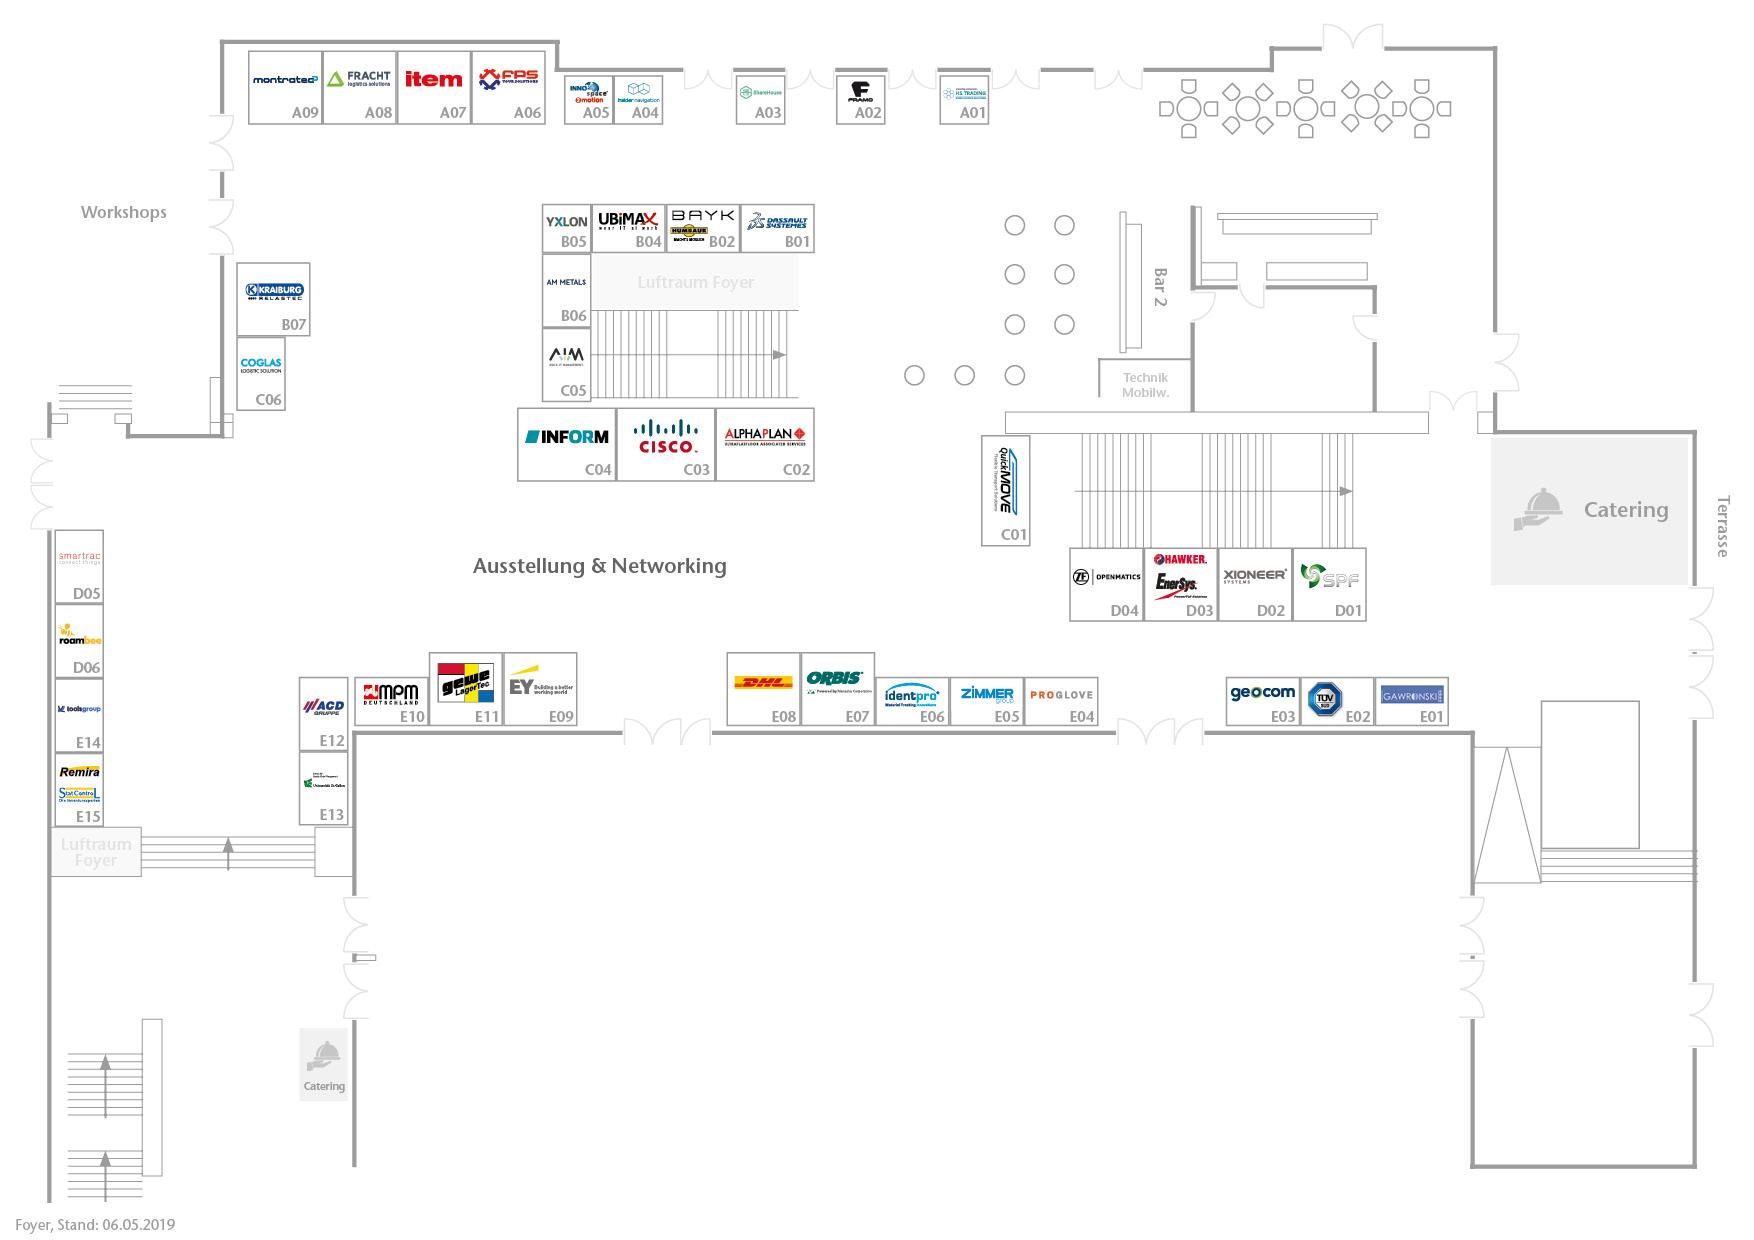 ILS19_Standplan_Foyer_Logos_de_190506.jpg